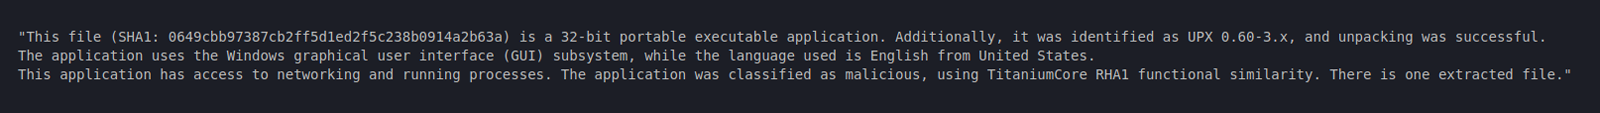 Human readable File Analysis output